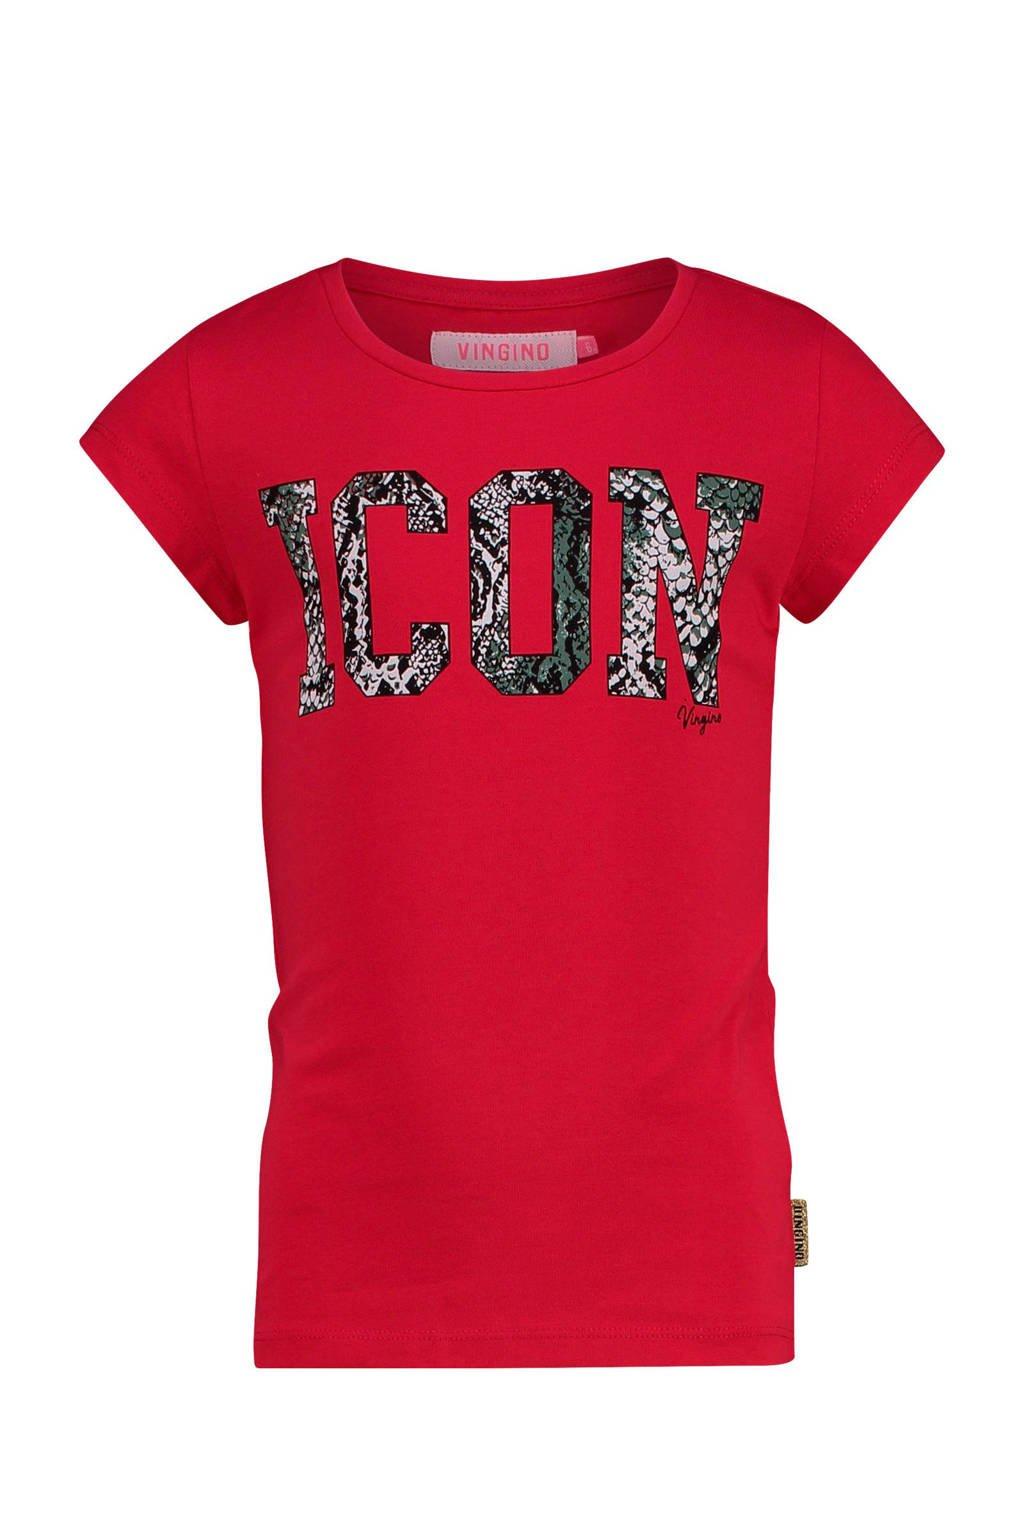 Vingino T-shirt Haydel met tekst rood, Rood